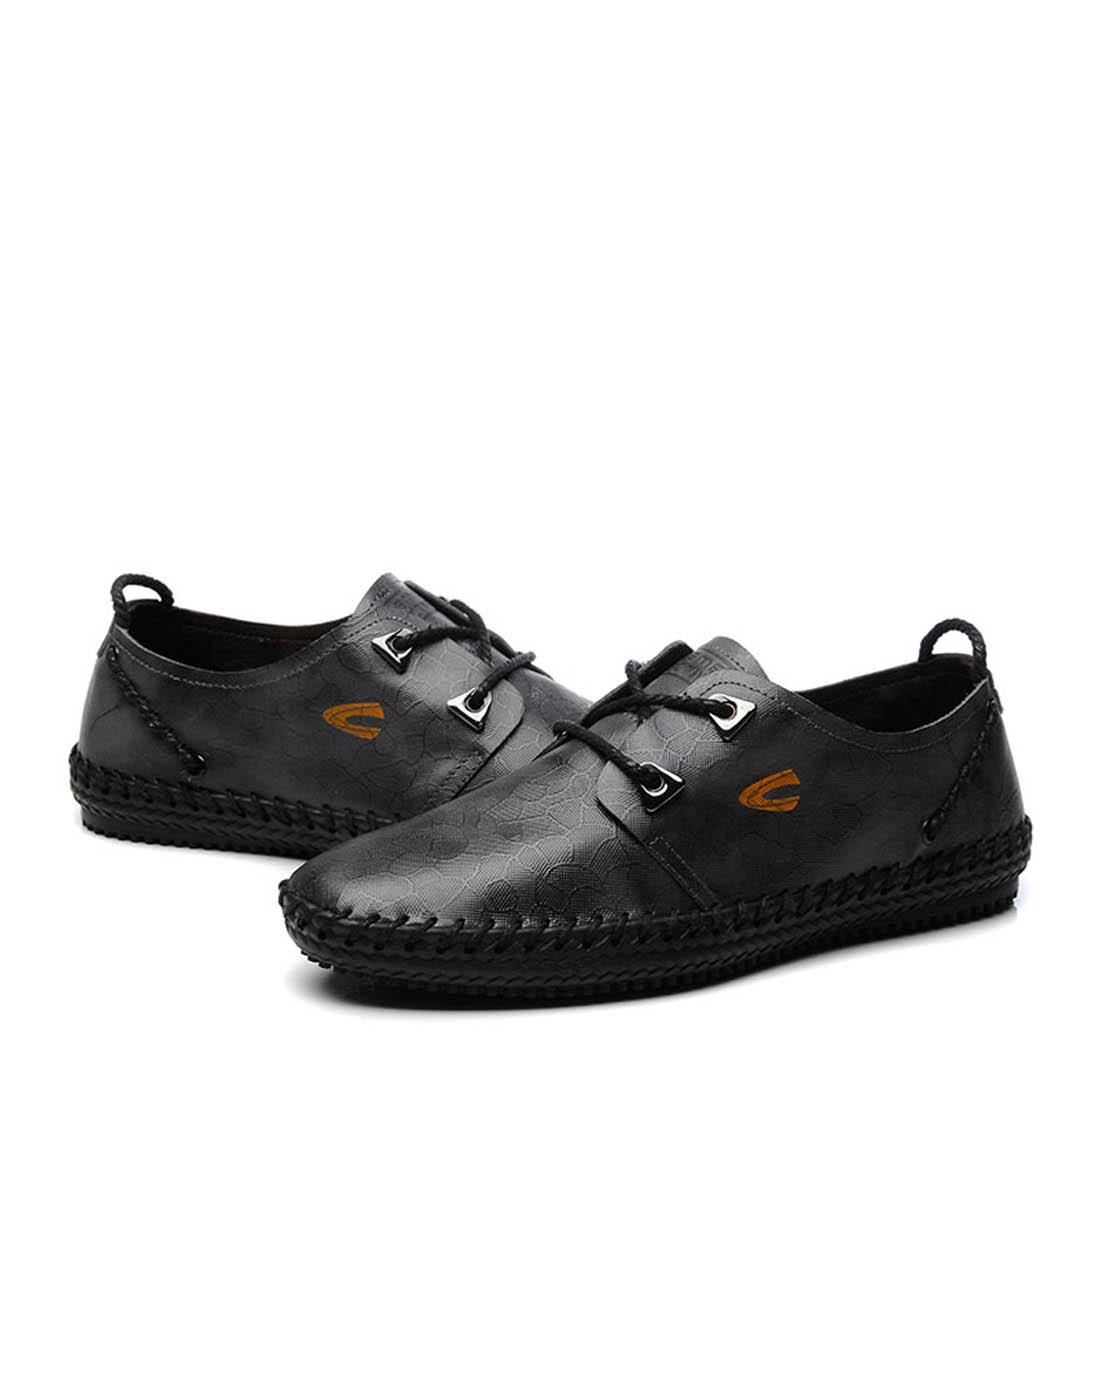 active男灰色休闲鞋c6360616815